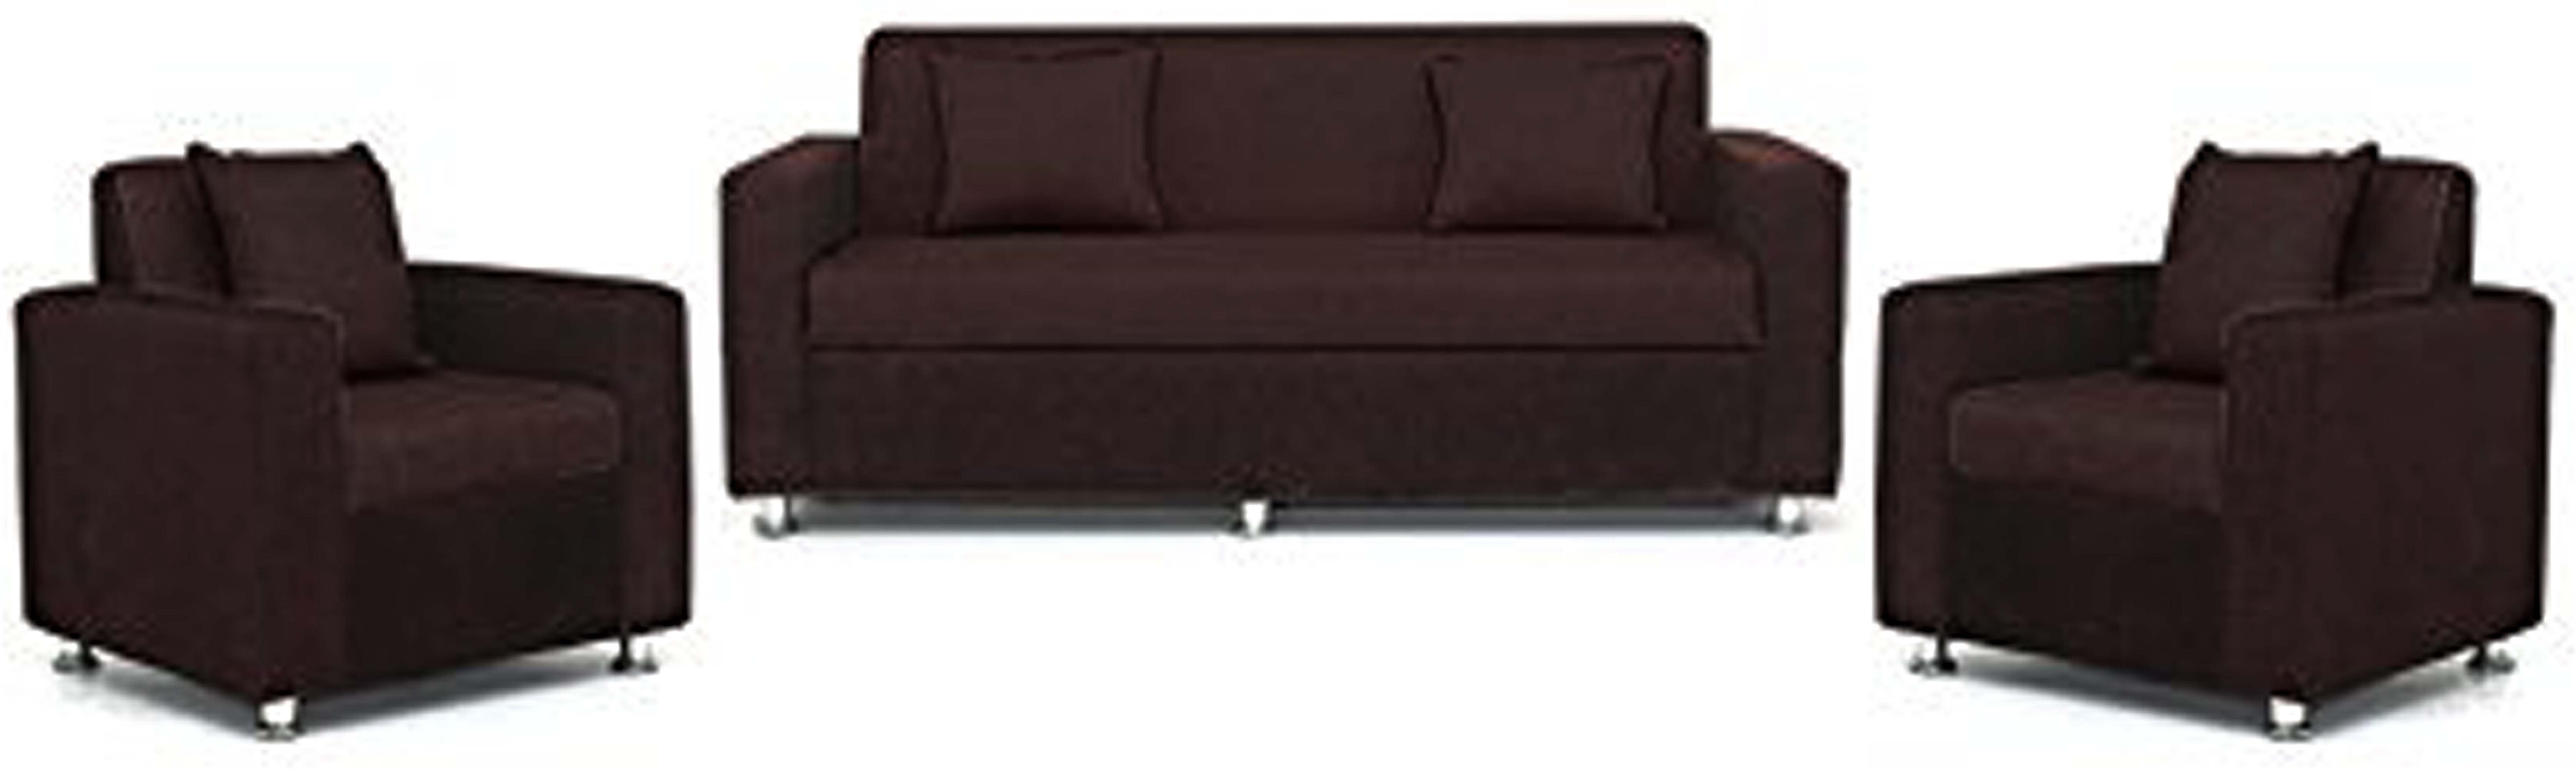 View Comfy Sofa Classy Fabric 3 + 1 + 1 Brown Sofa Set(Configuration - Straight) Furniture (COMFY SOFA)